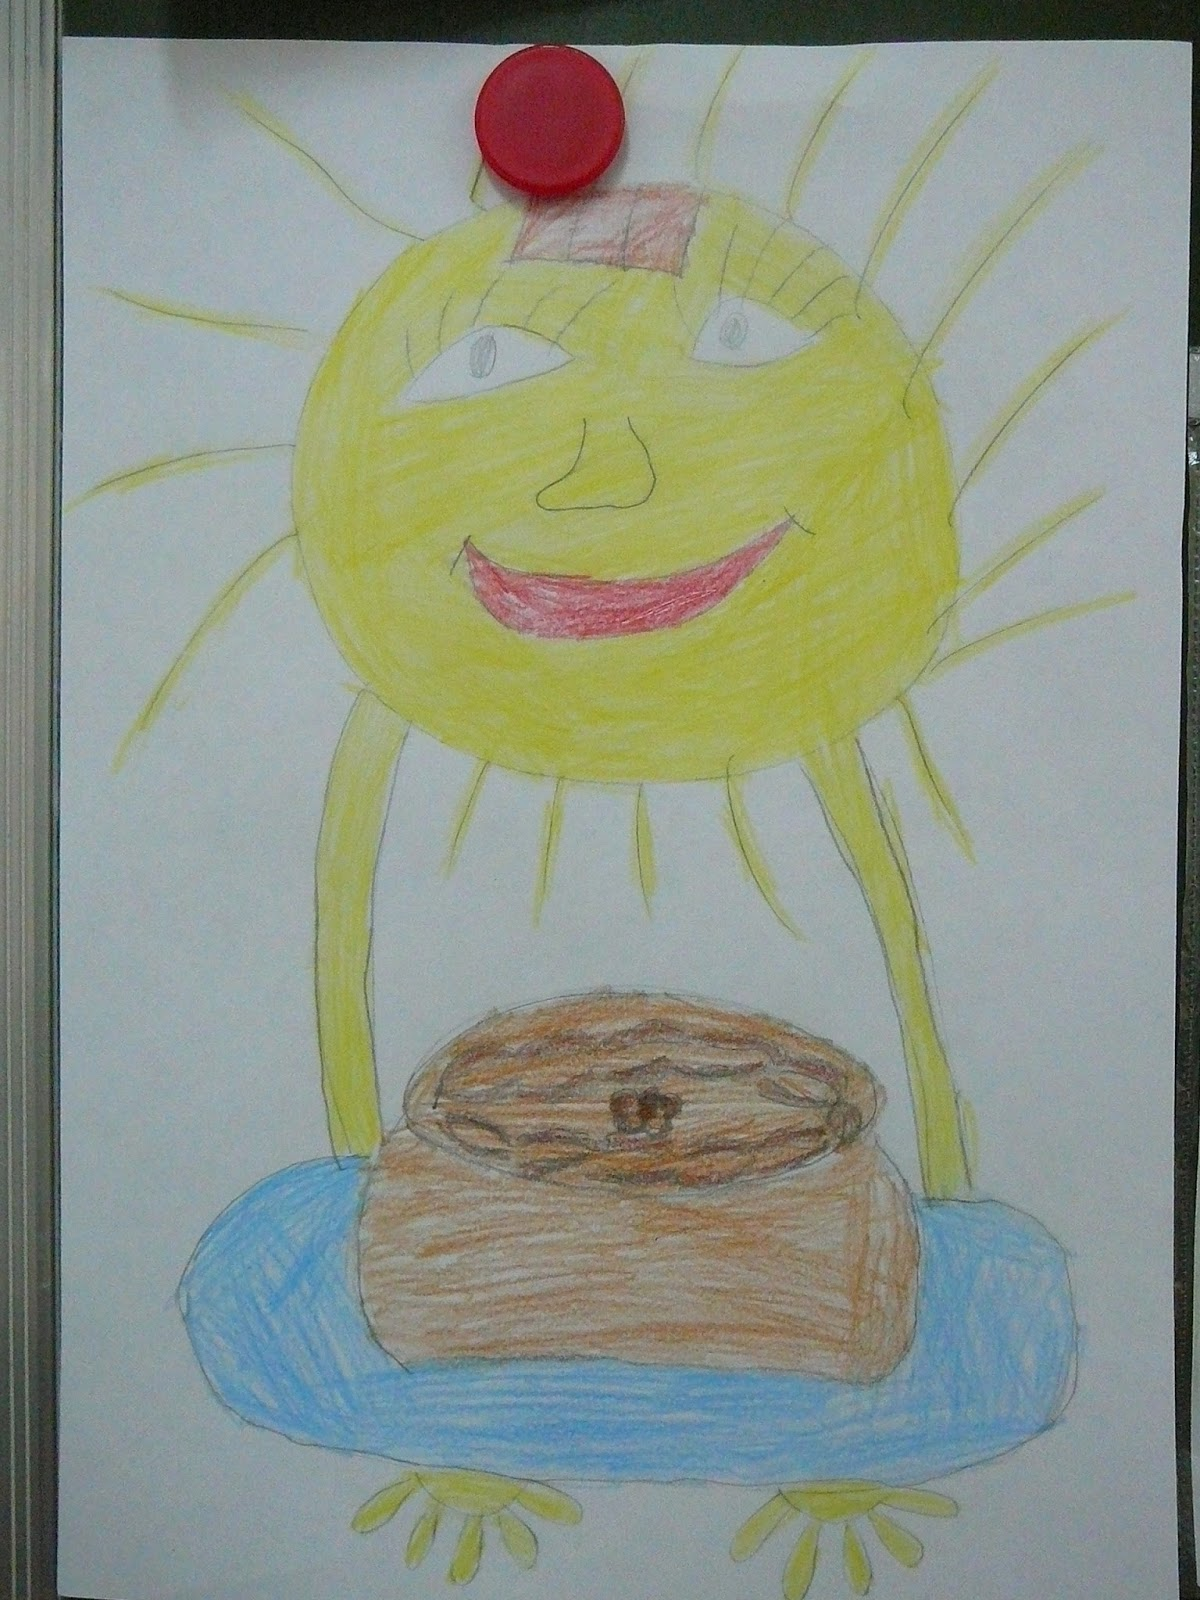 Рисунки на конкурс хлеб всему голова